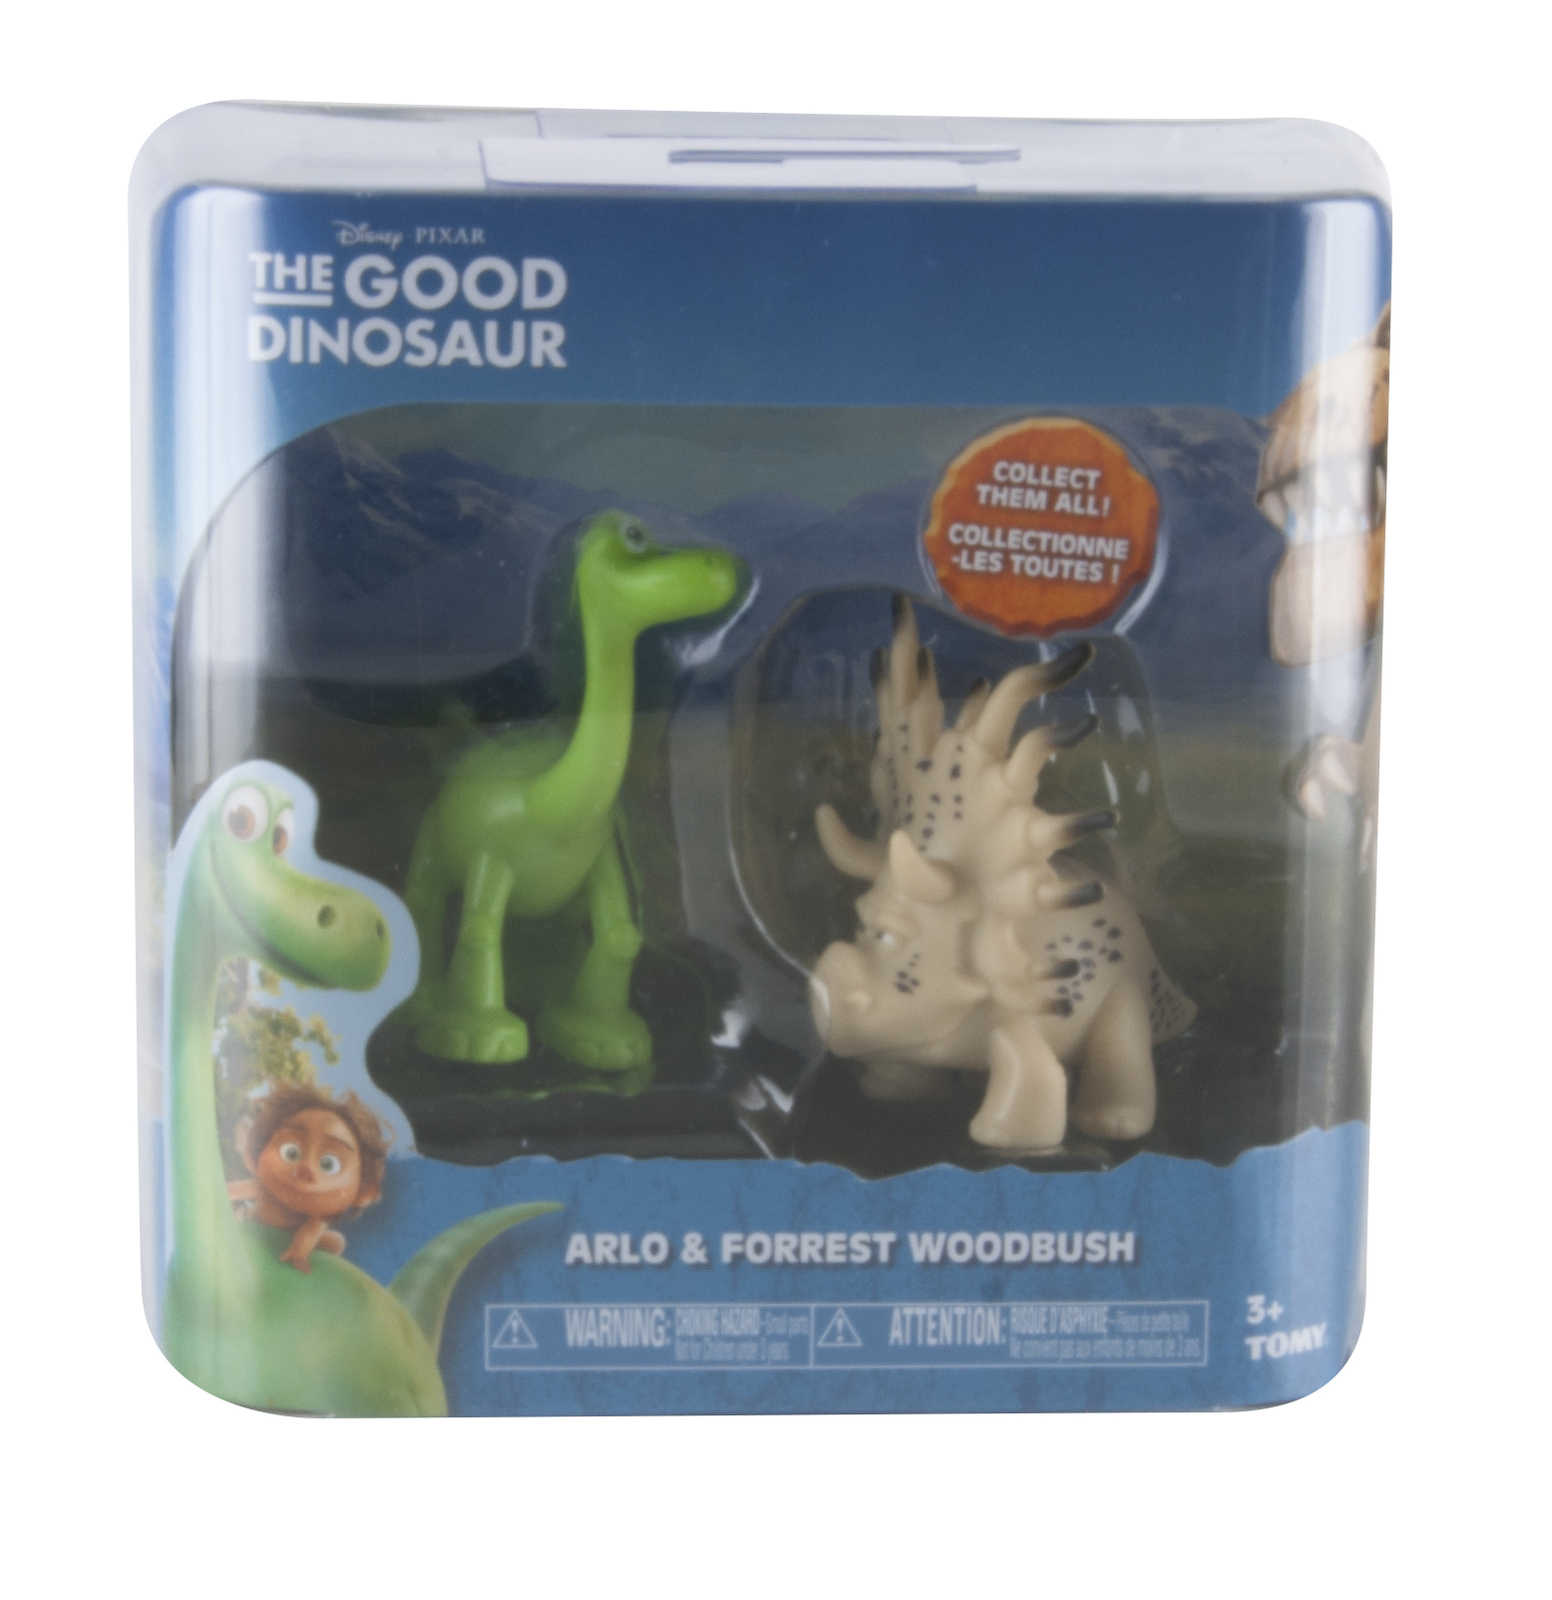 the good dinosaur arlo forrest woodbush collectible figurine 2